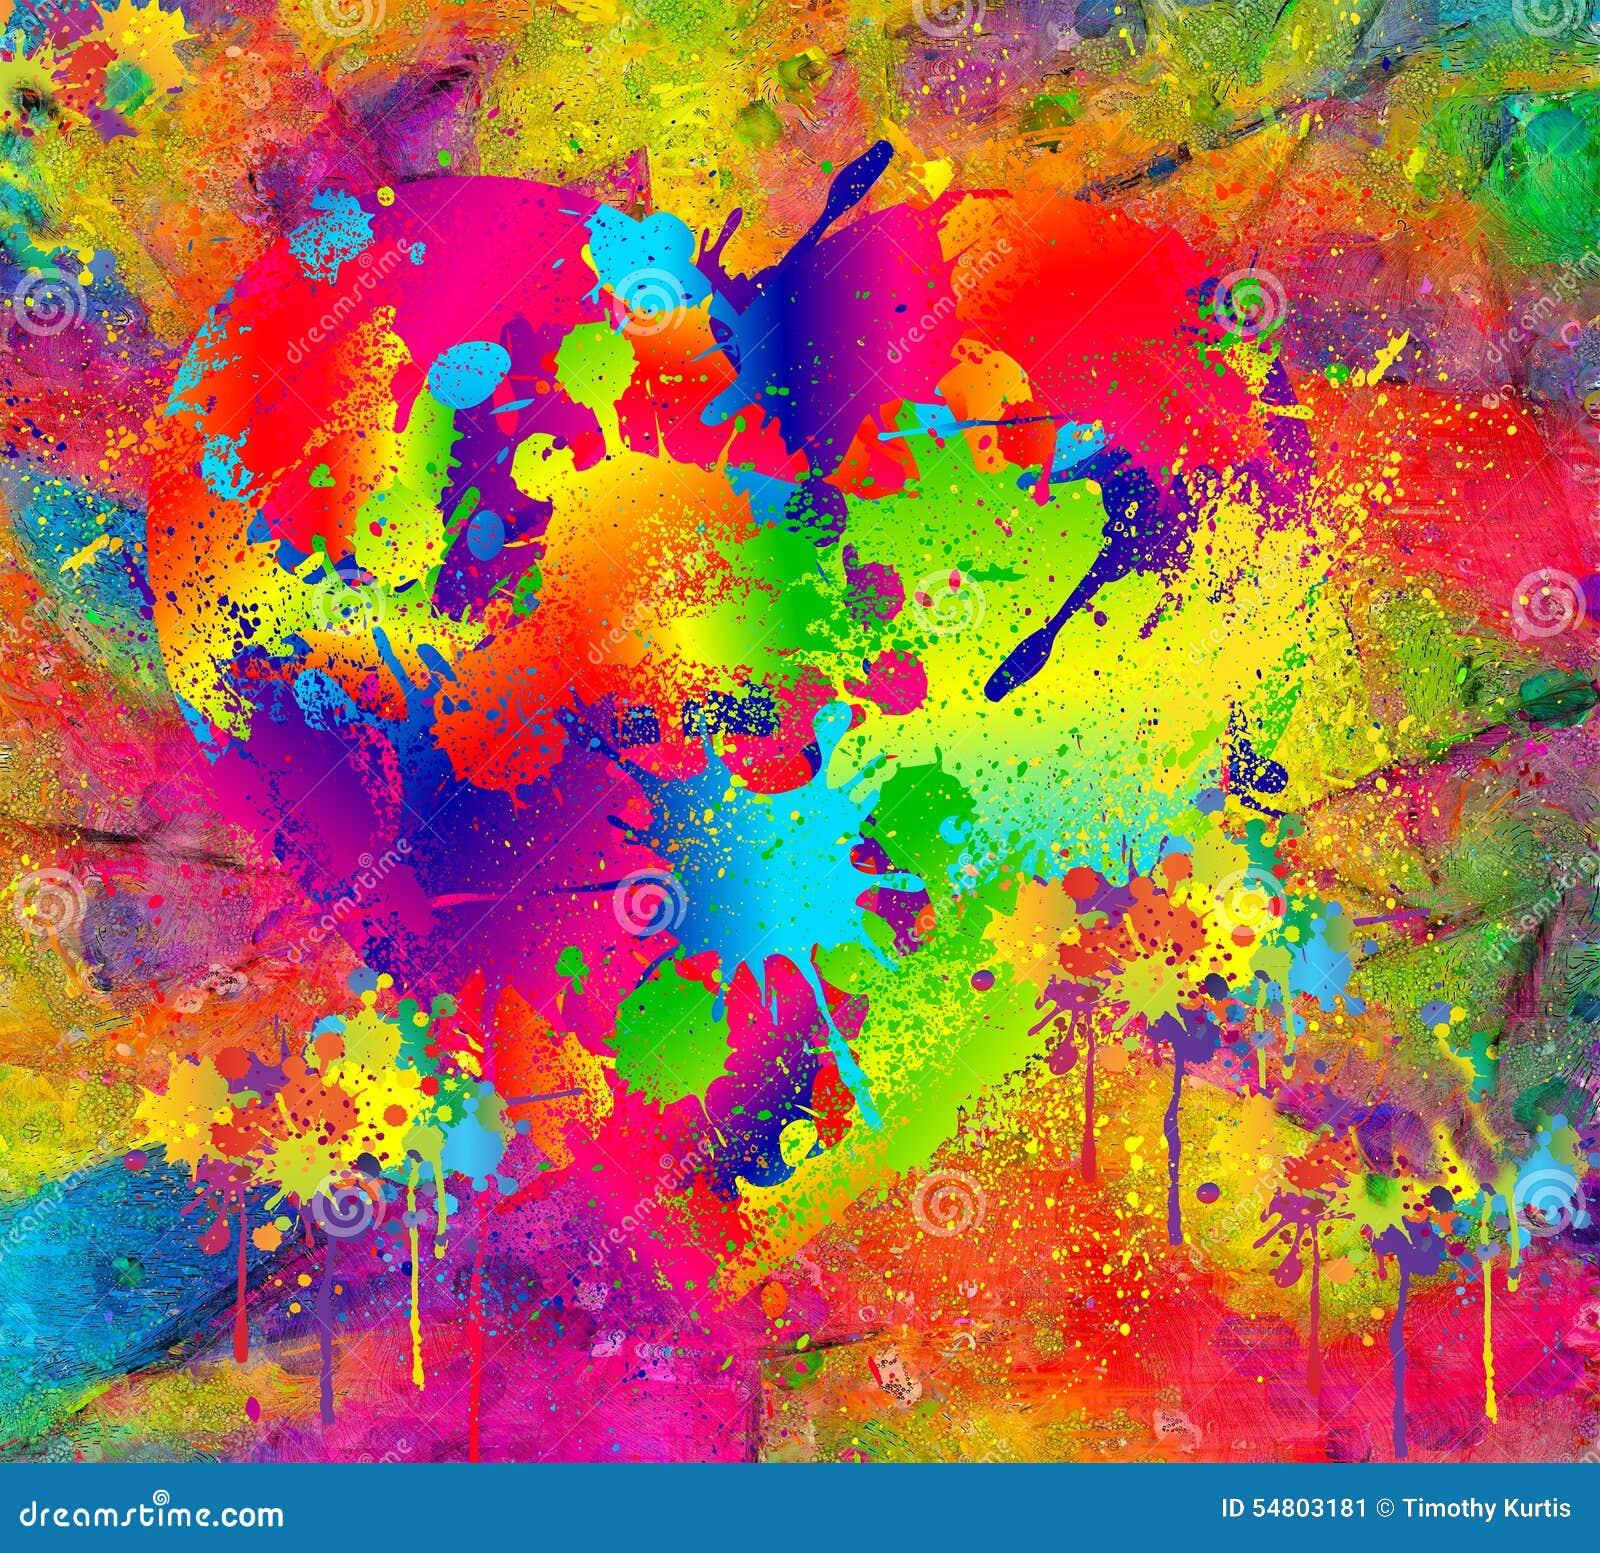 Paint texture paints background download photo color paint texture - Abstrakter Hintergrund Bunte Frische Farbe Mit